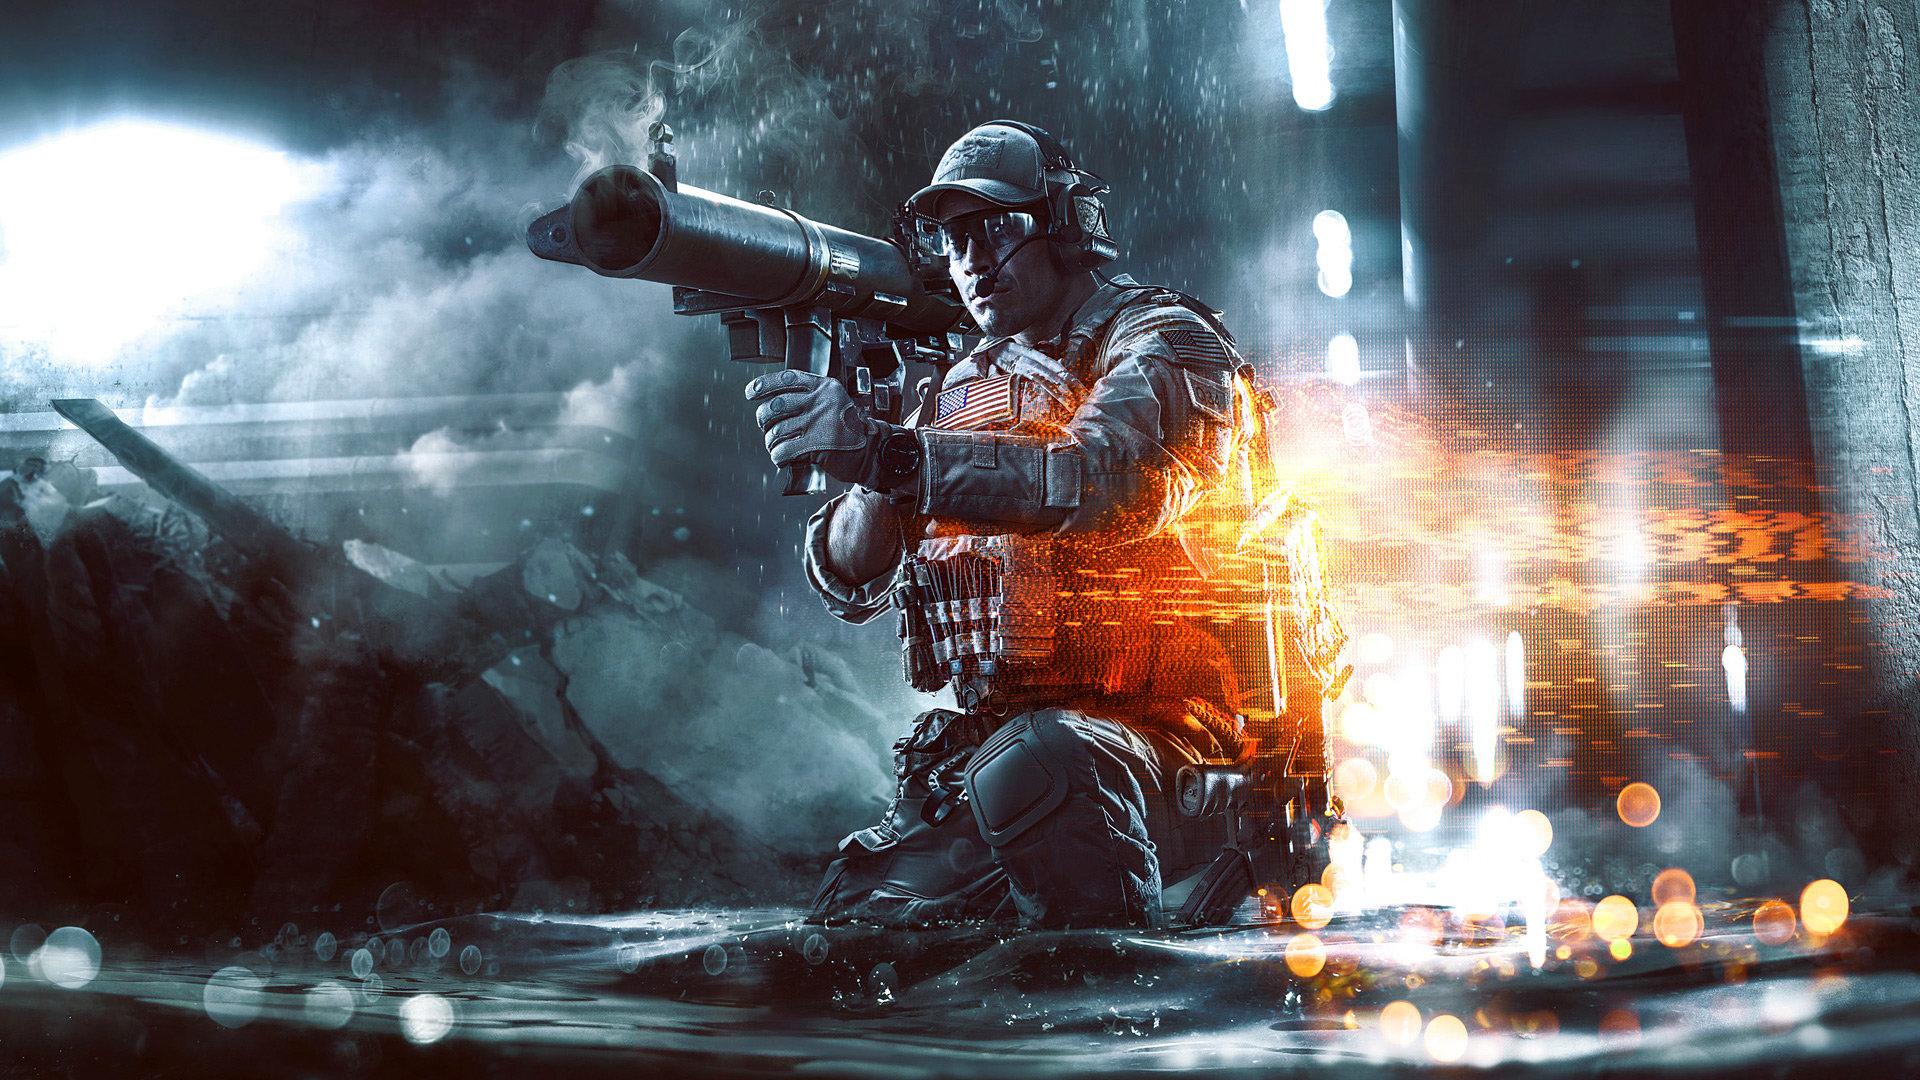 Battlefield 4 Wallpapers 1920x1080 Full Hd 1080p Desktop Backgrounds